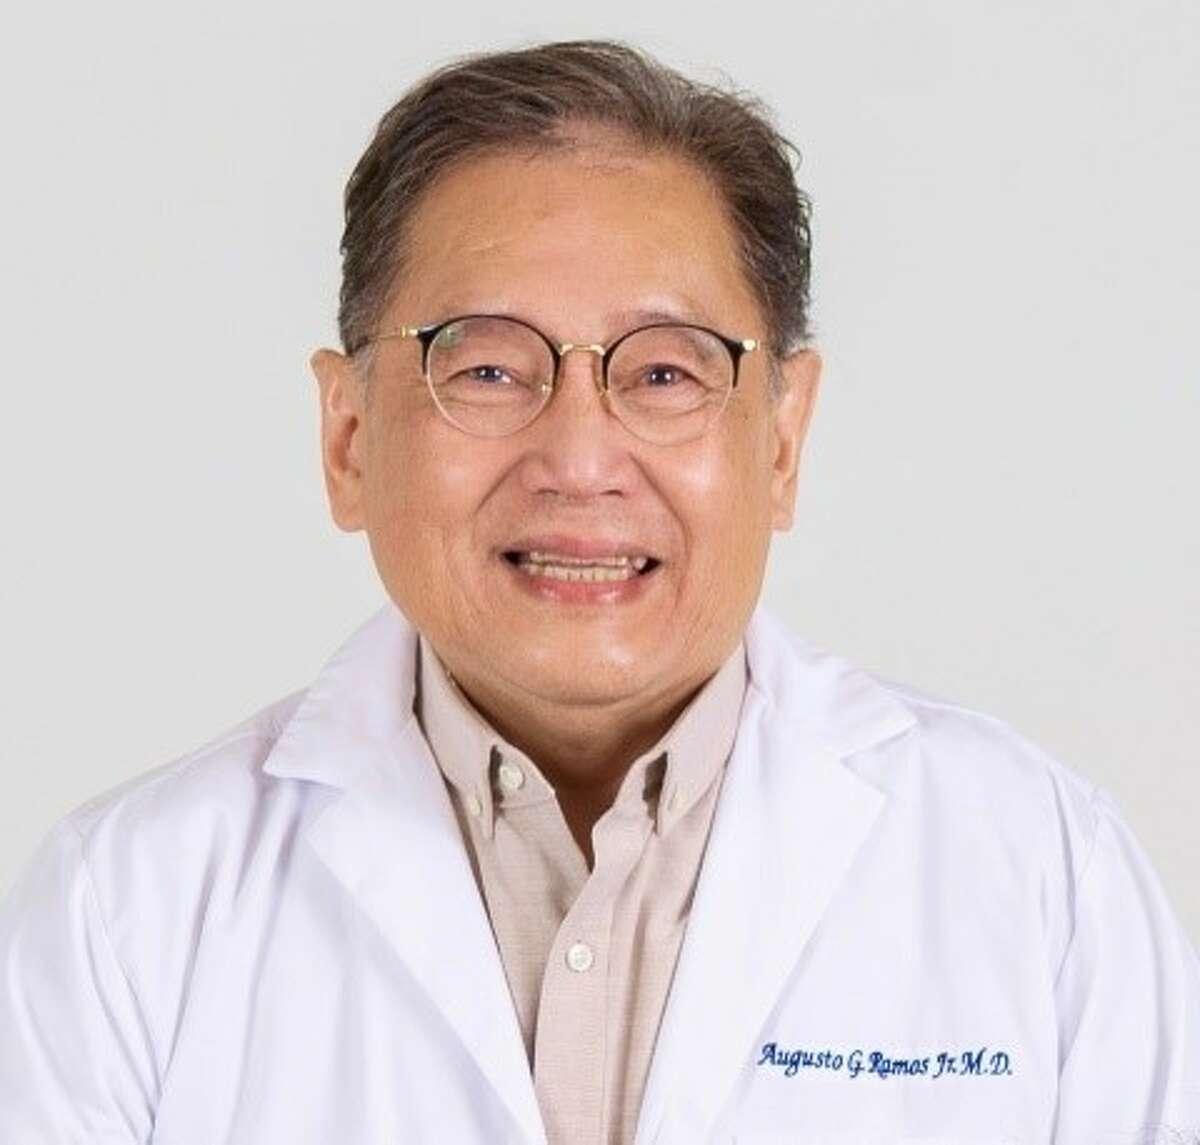 Dr. Augusto Patricio Gueco Ramos, Jr